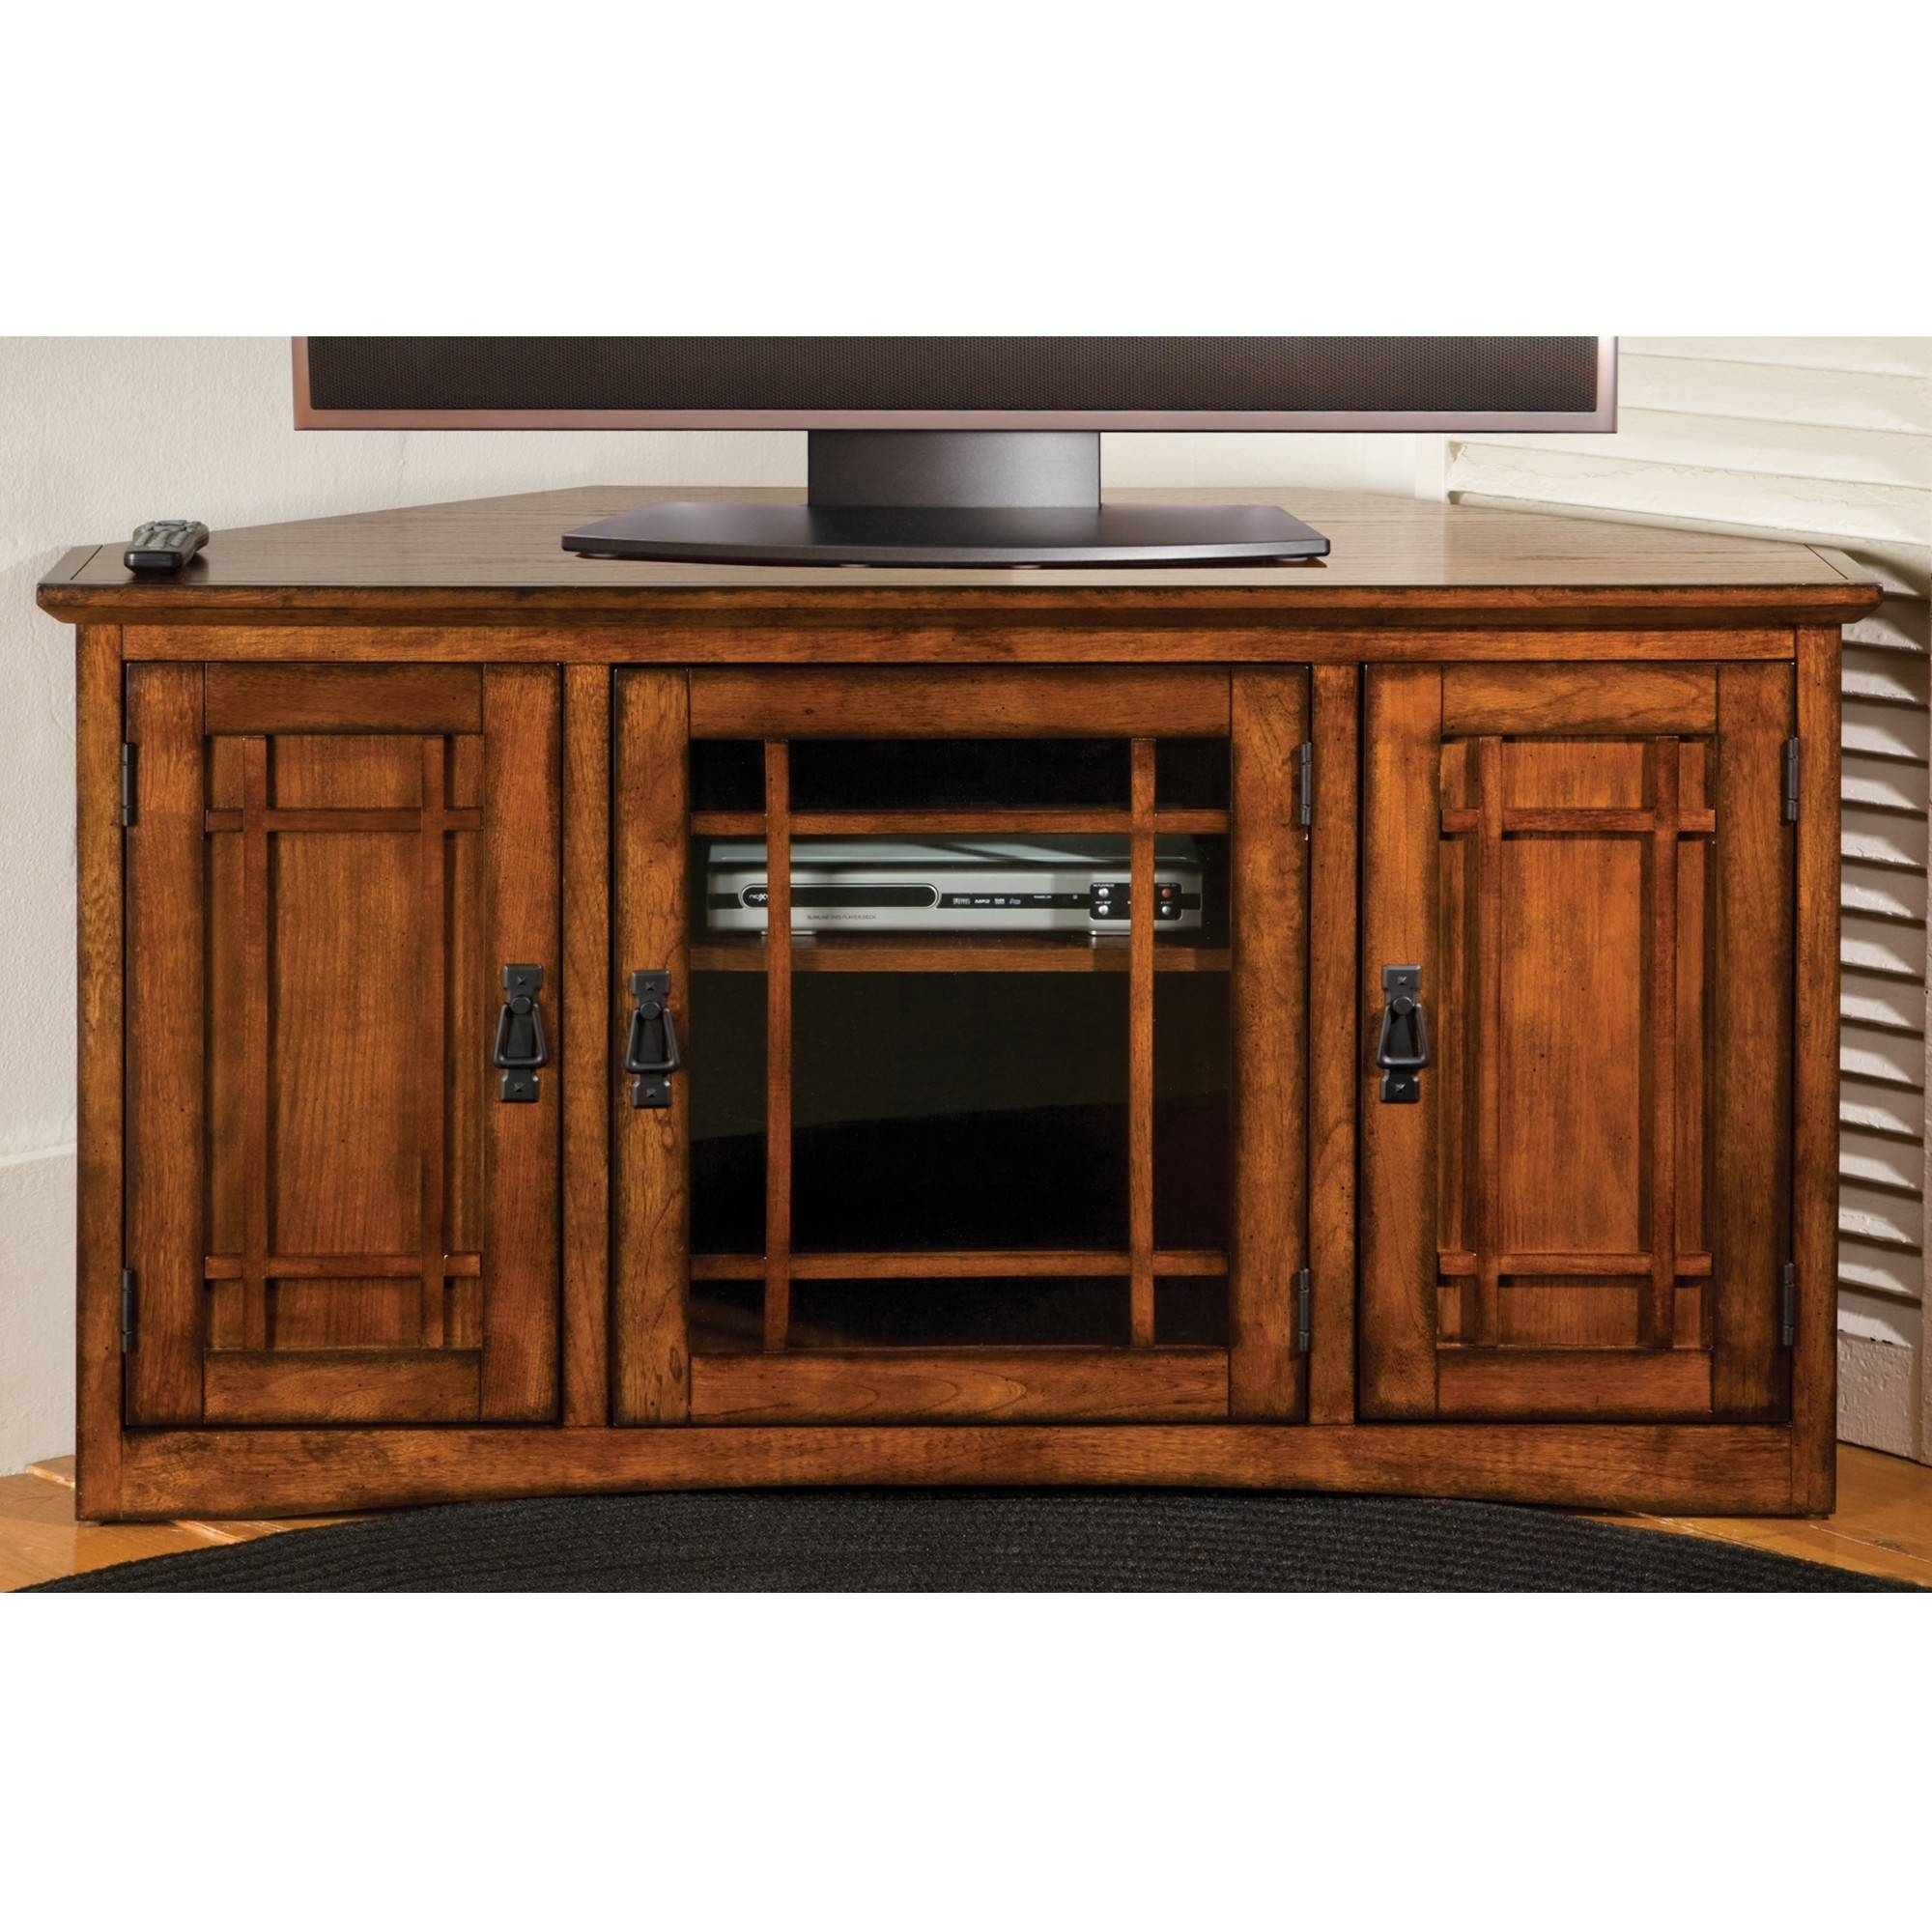 Mission Corner Tv Cabinet | Sturbridge Yankee Workshop pertaining to Black Wood Corner Tv Stands (Image 9 of 15)